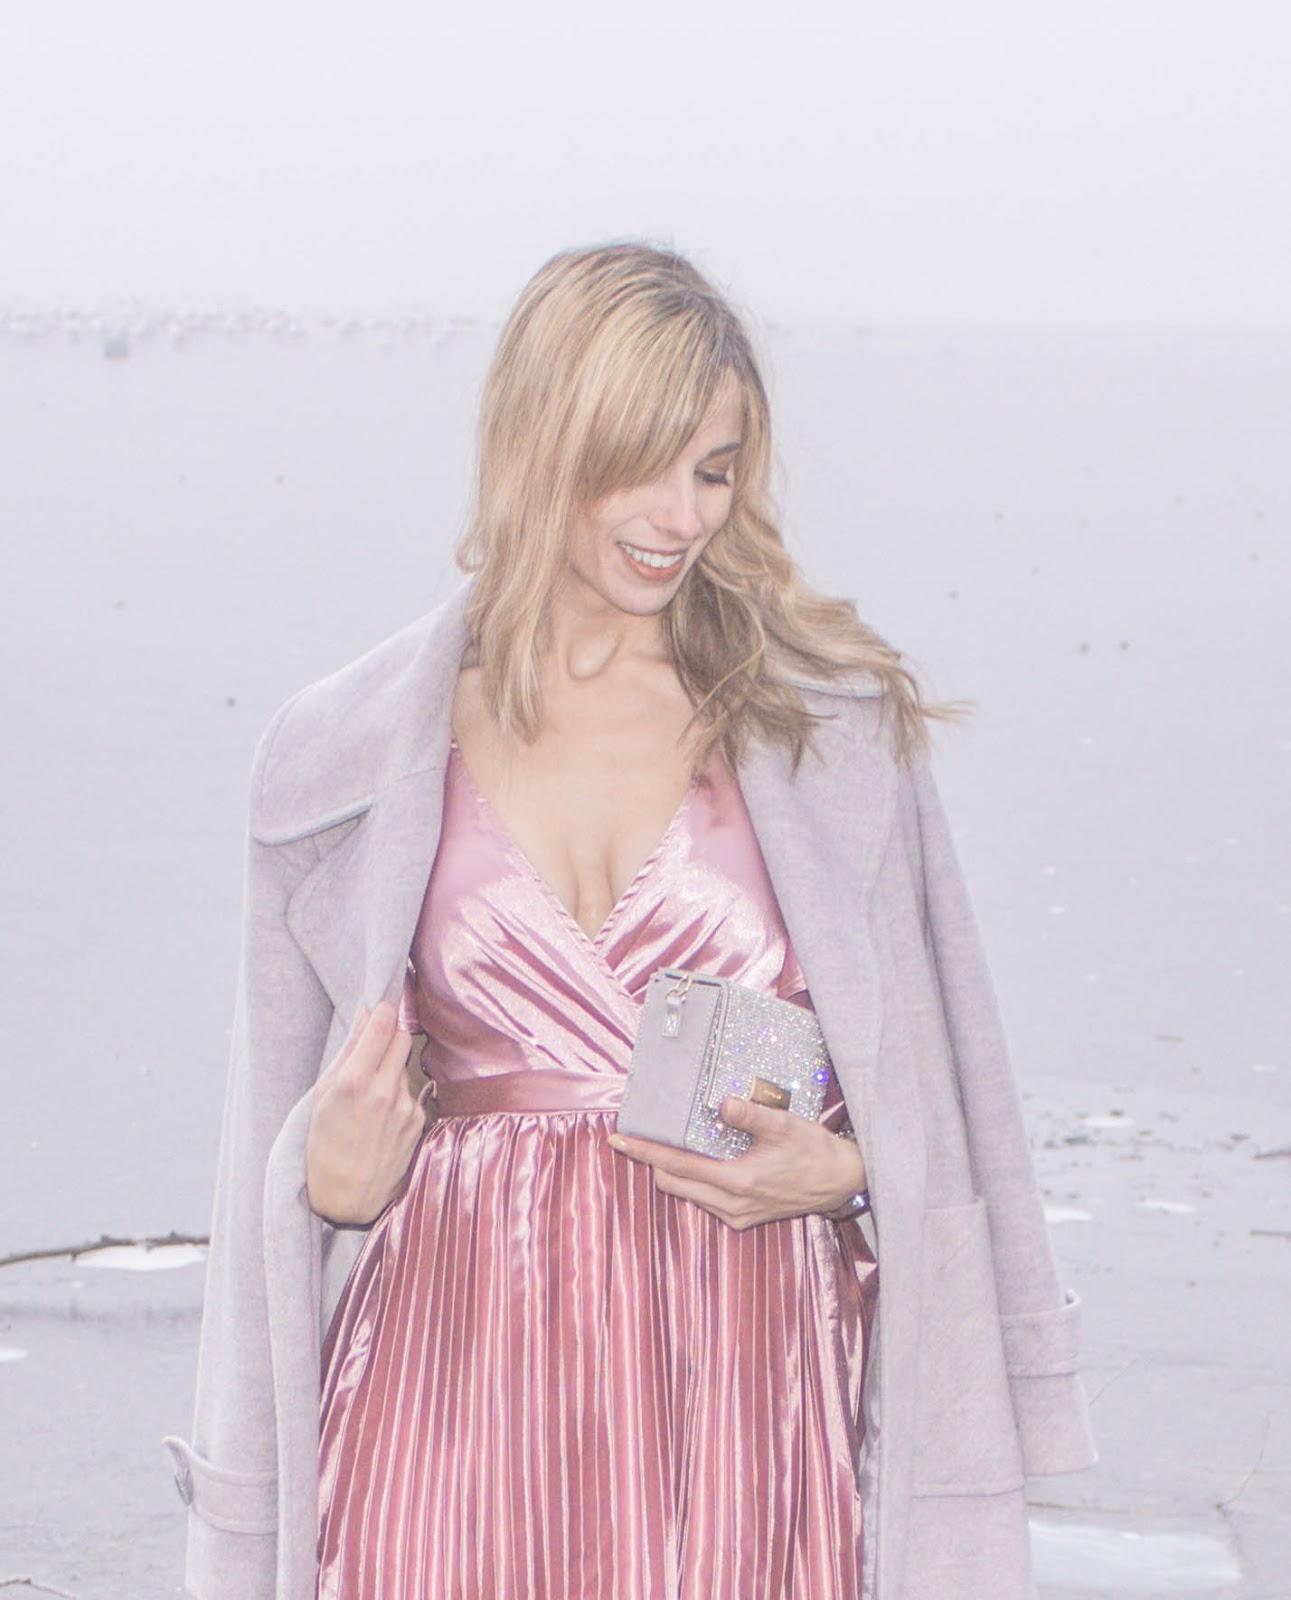 Pink Dress And Grey Coat